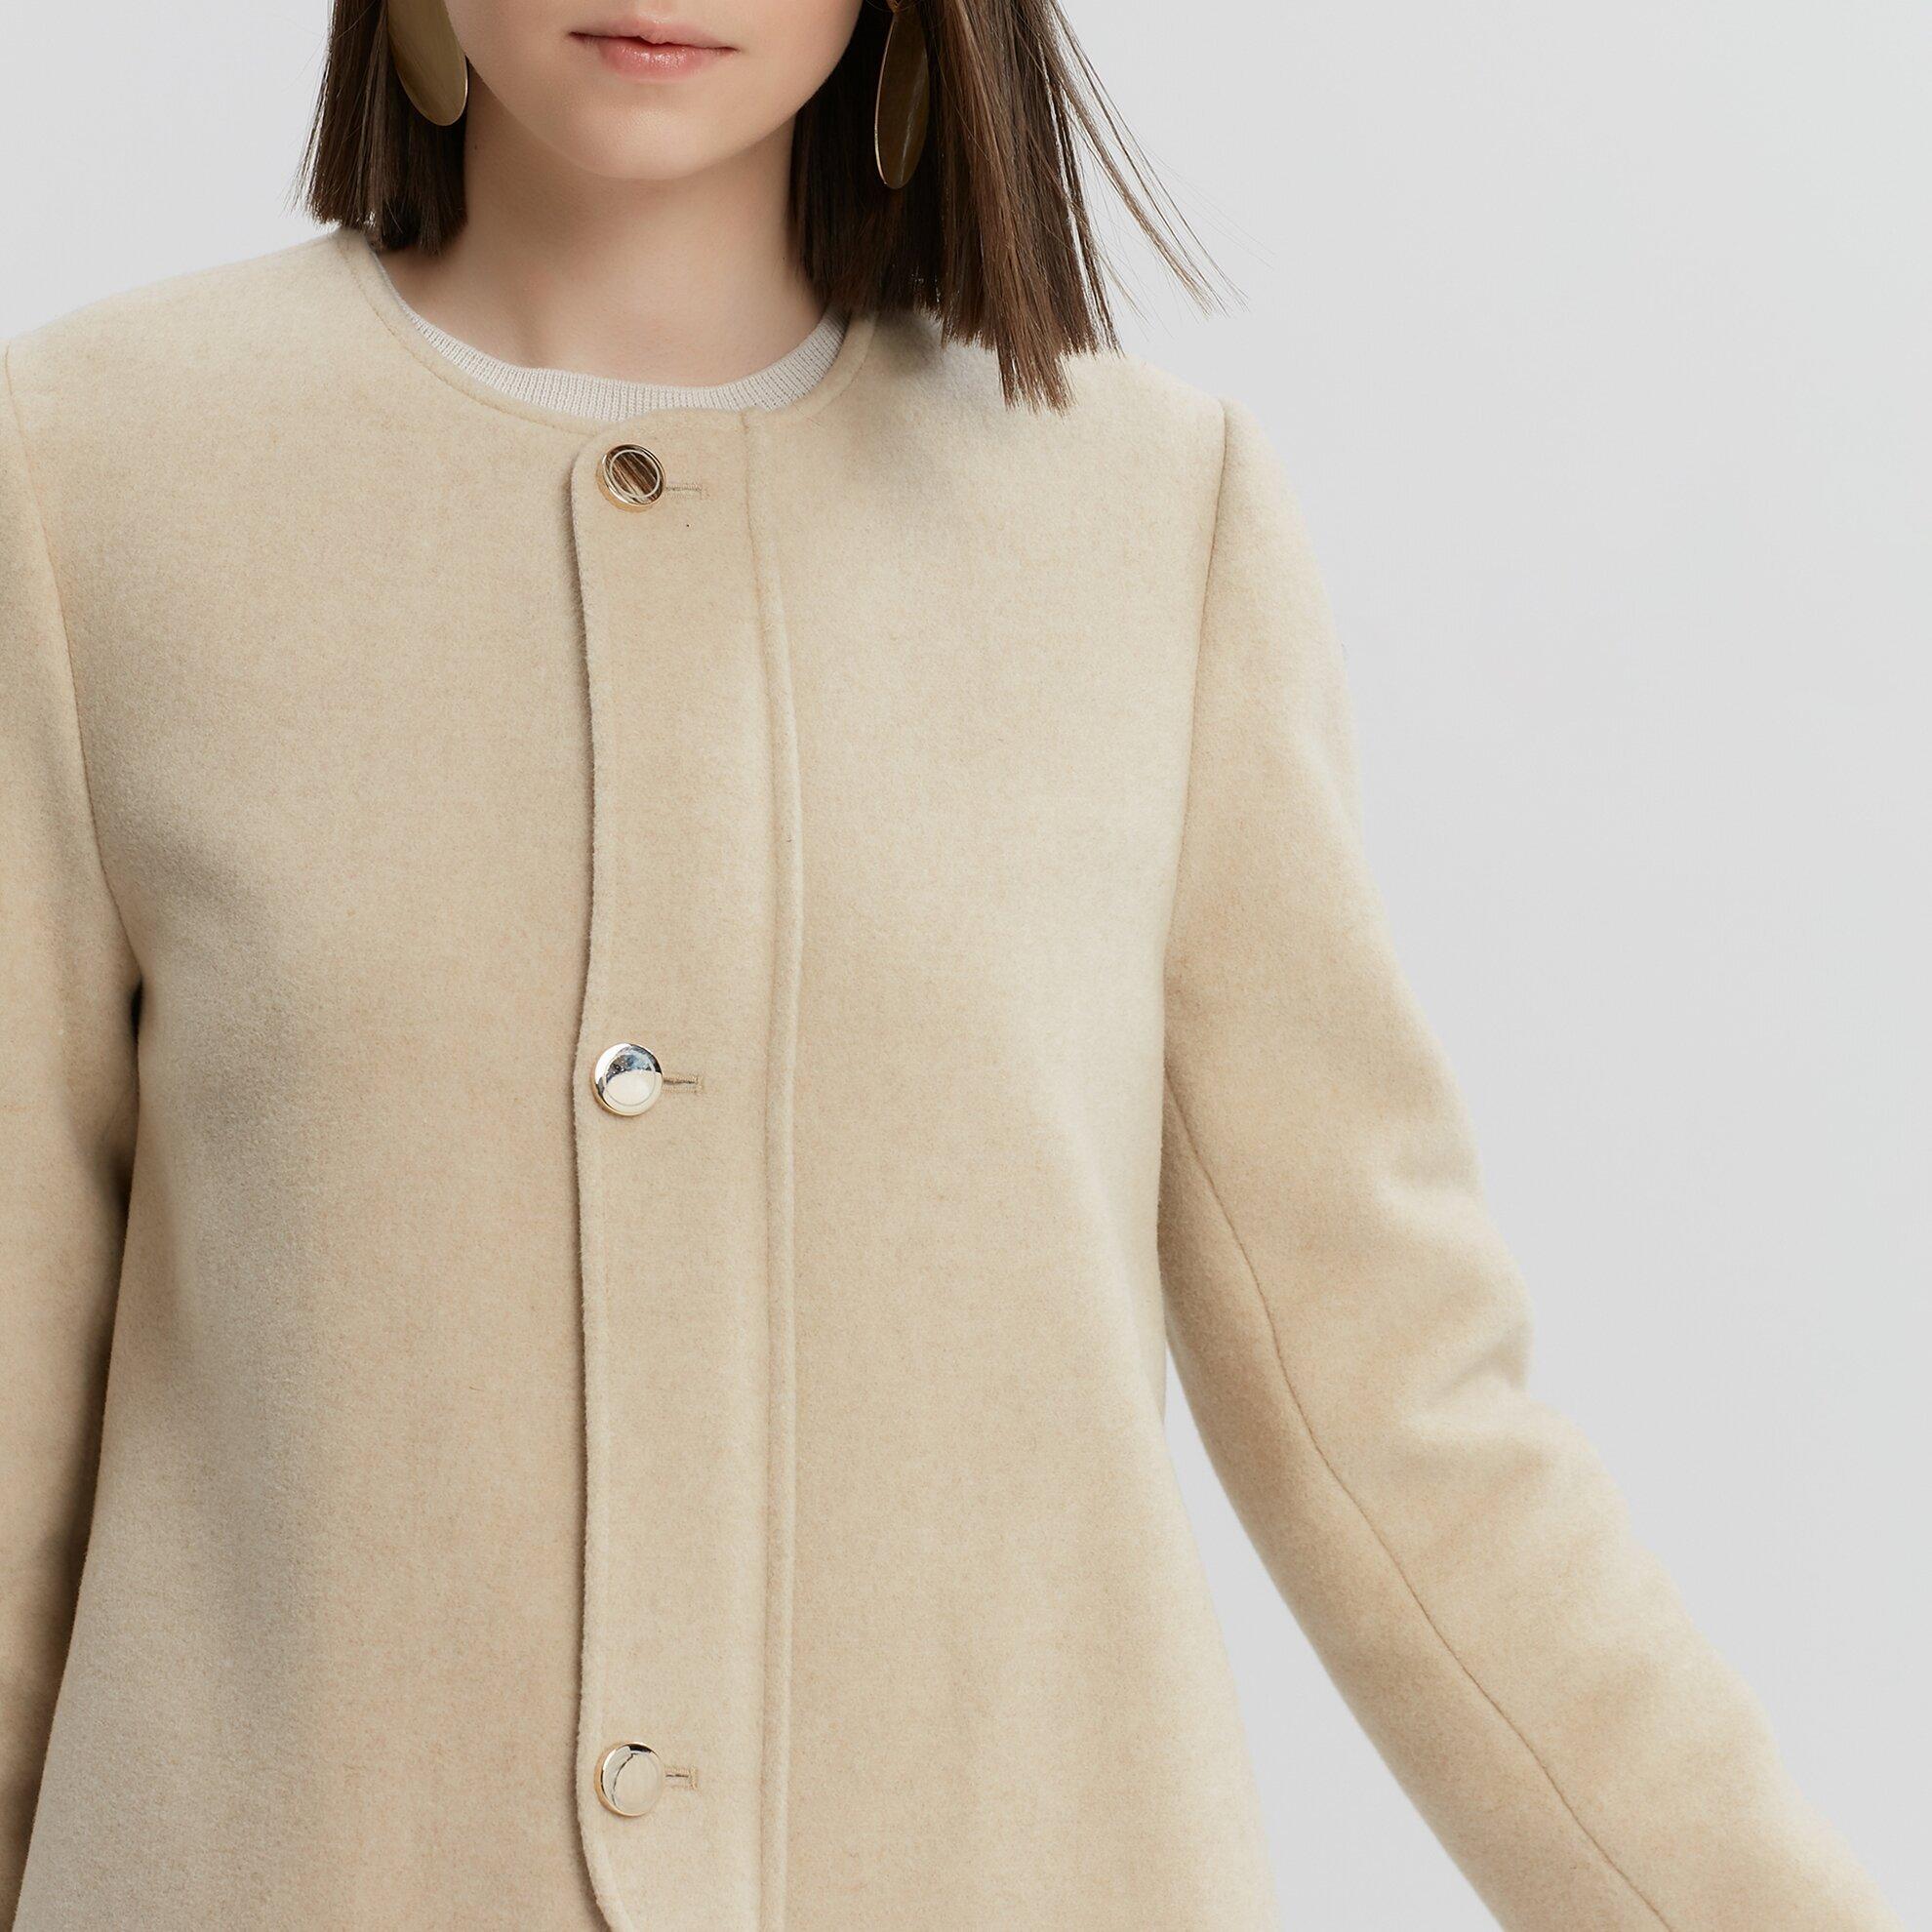 Bağlama Detaylı Uzun Palto